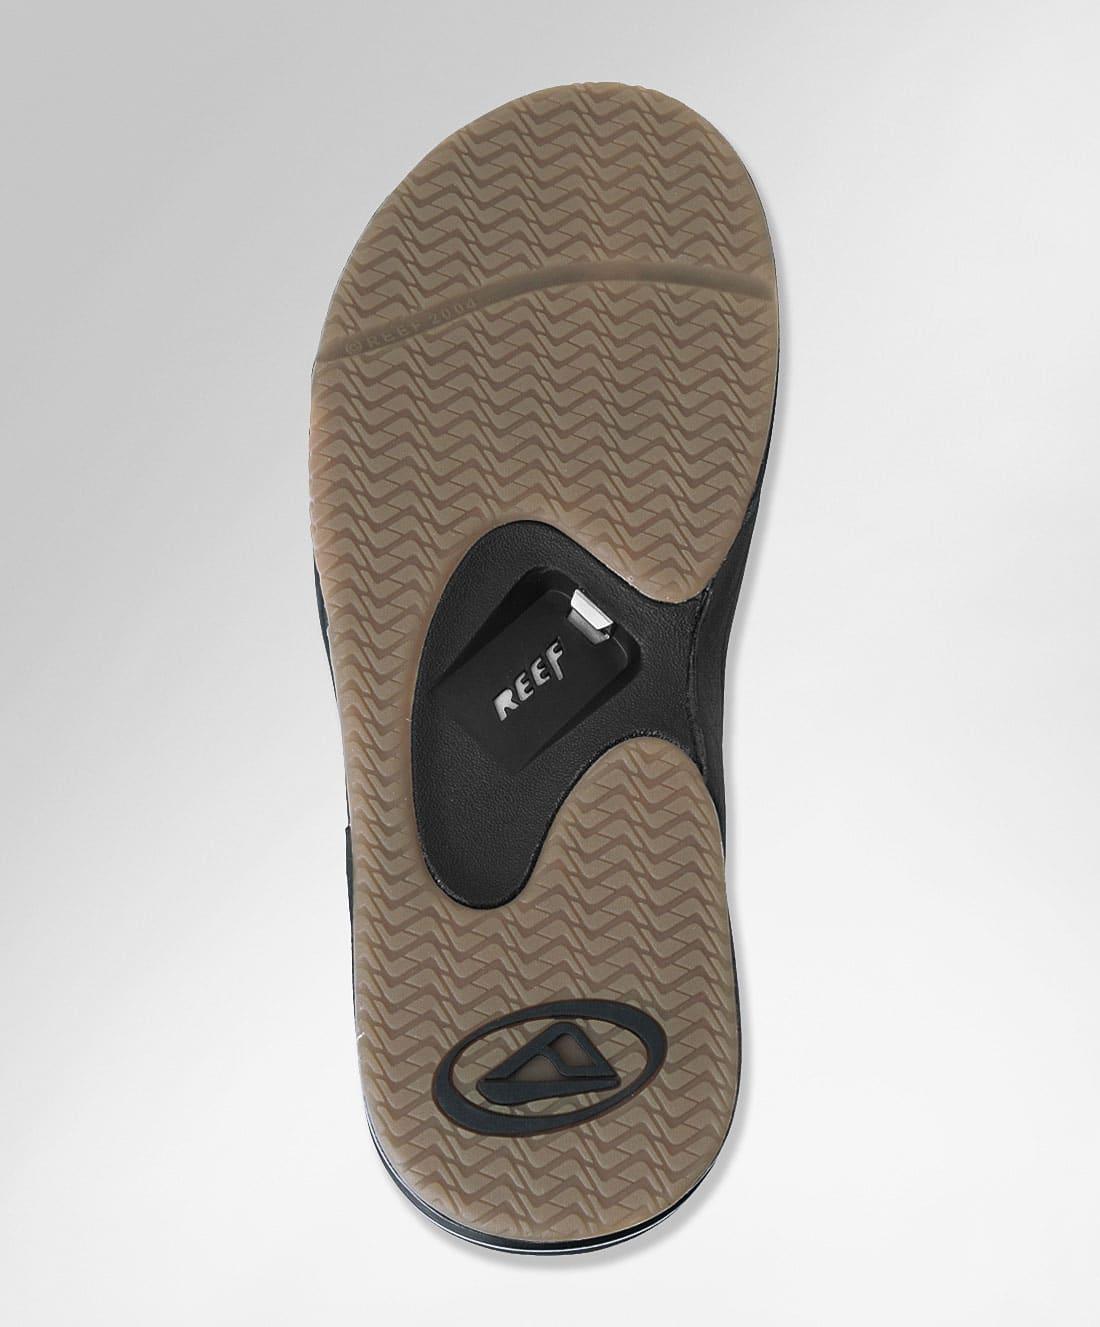 bottle flip flops